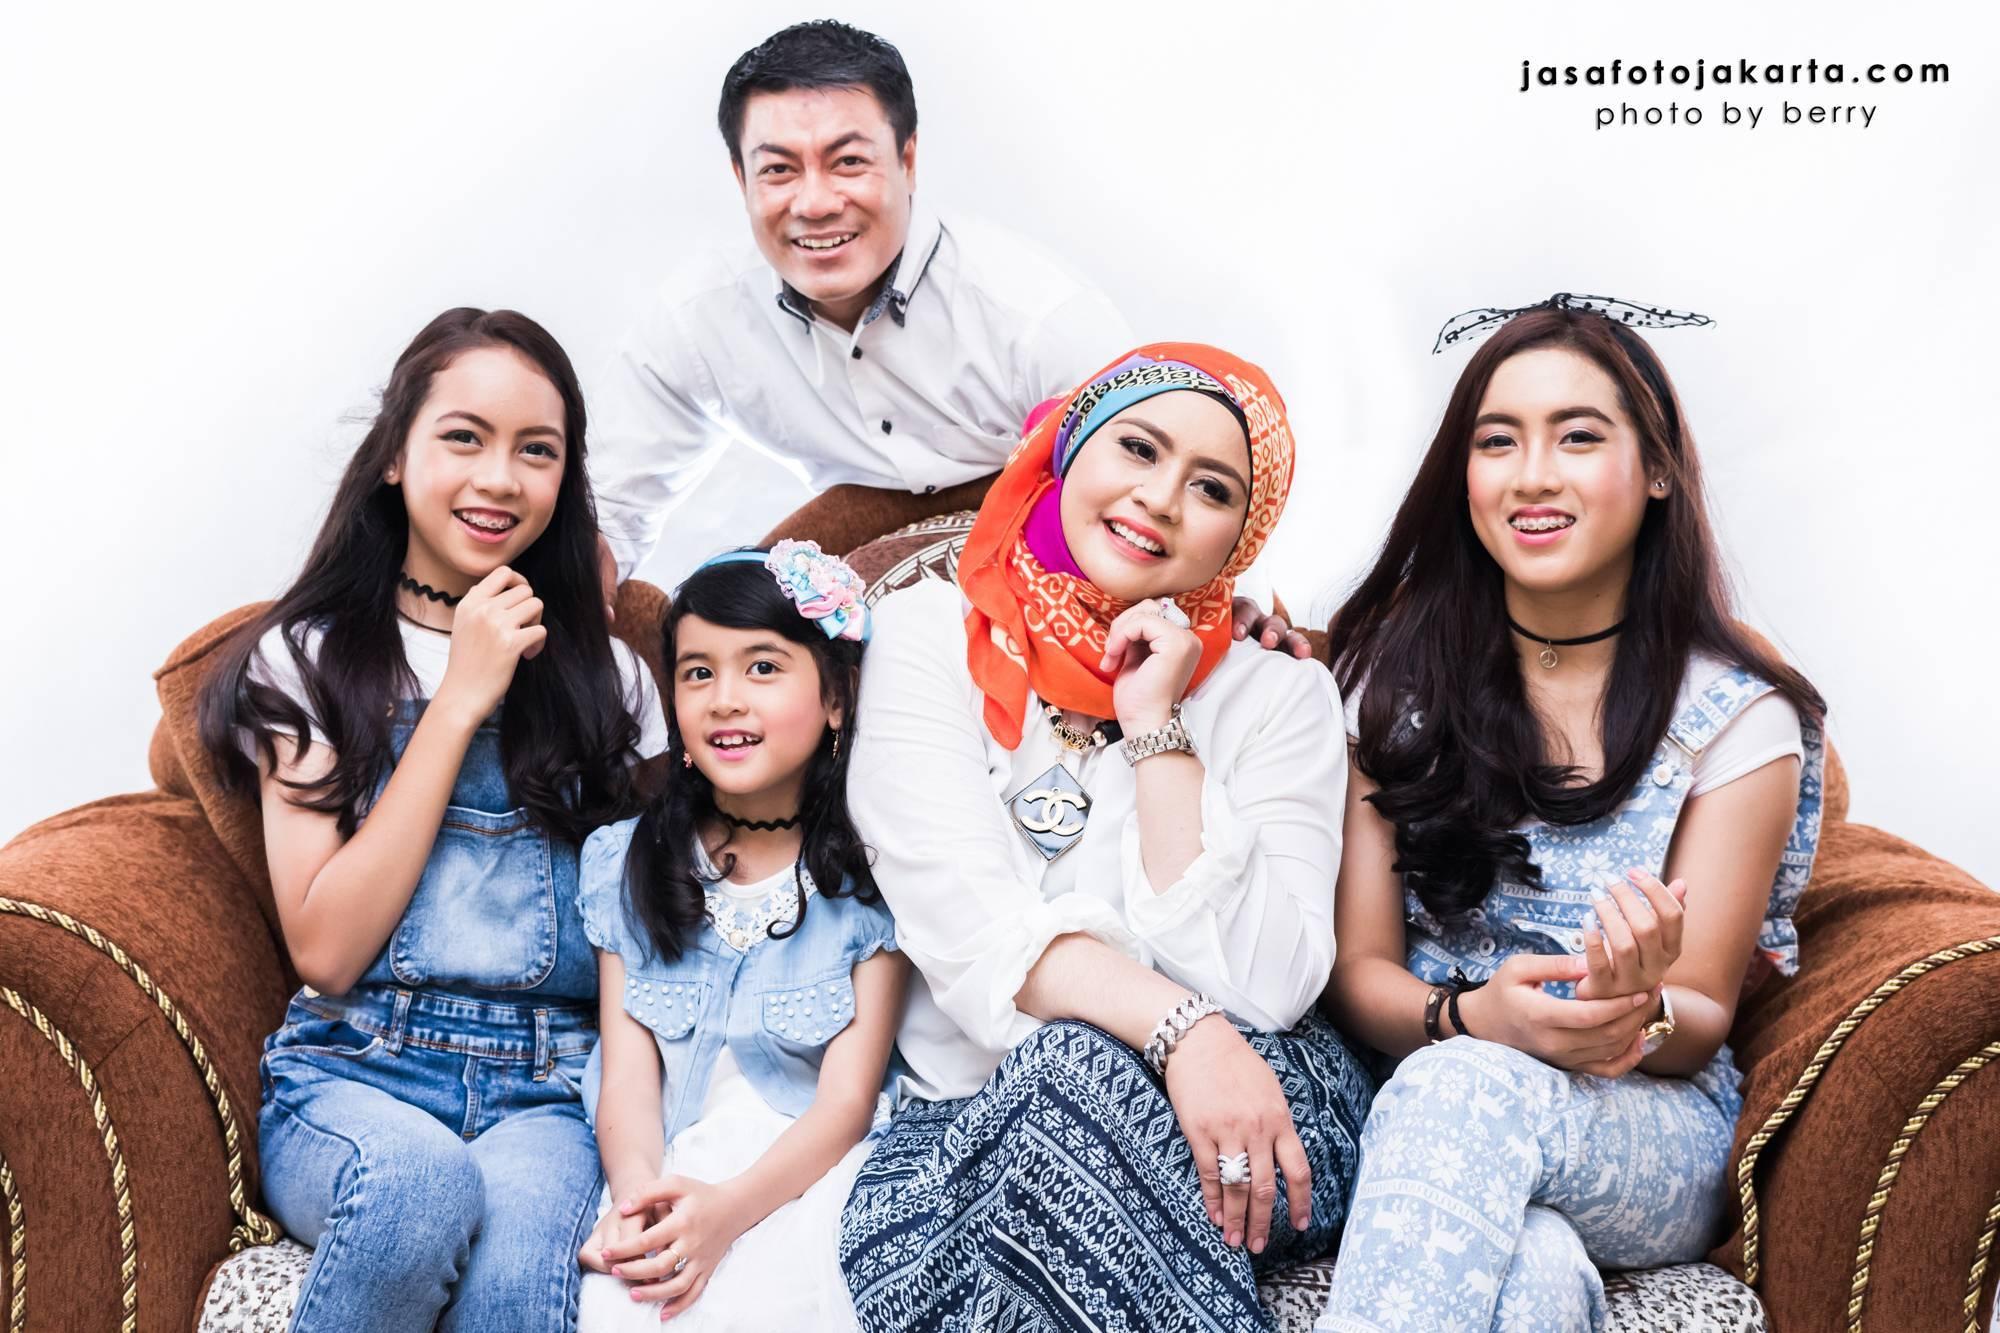 7 Gaya Foto Studio Keluarga Yang Menarik Jasa Fotografi Di Jakarta